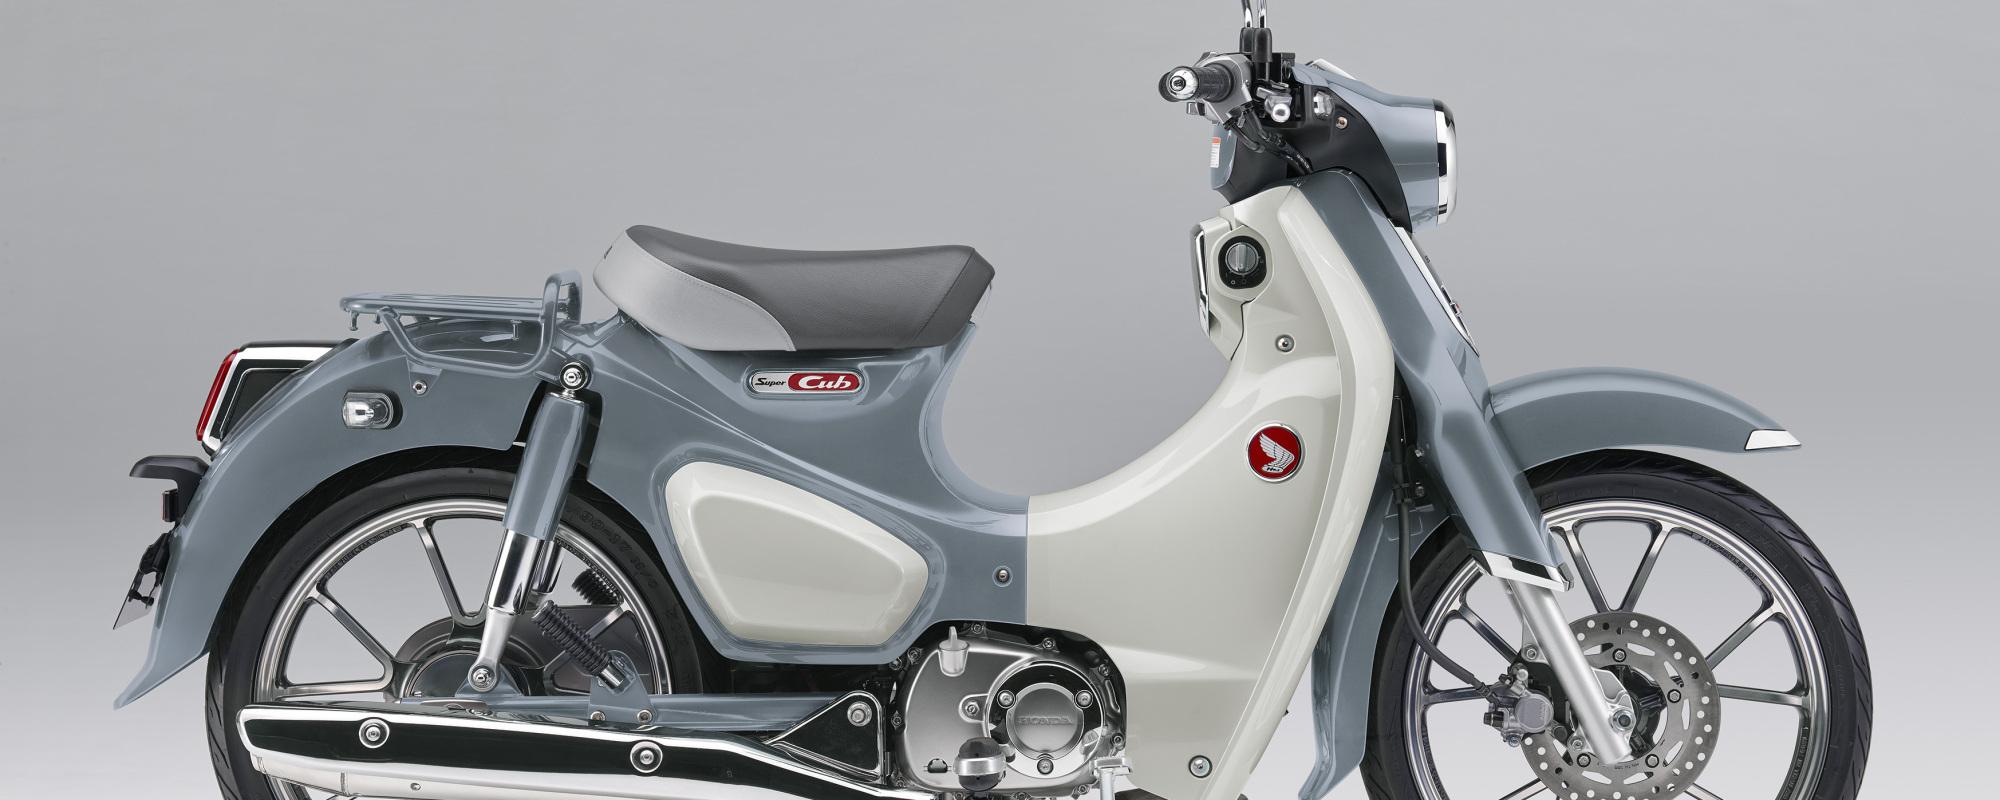 _MainSlider_01_Honda SuperCub C125